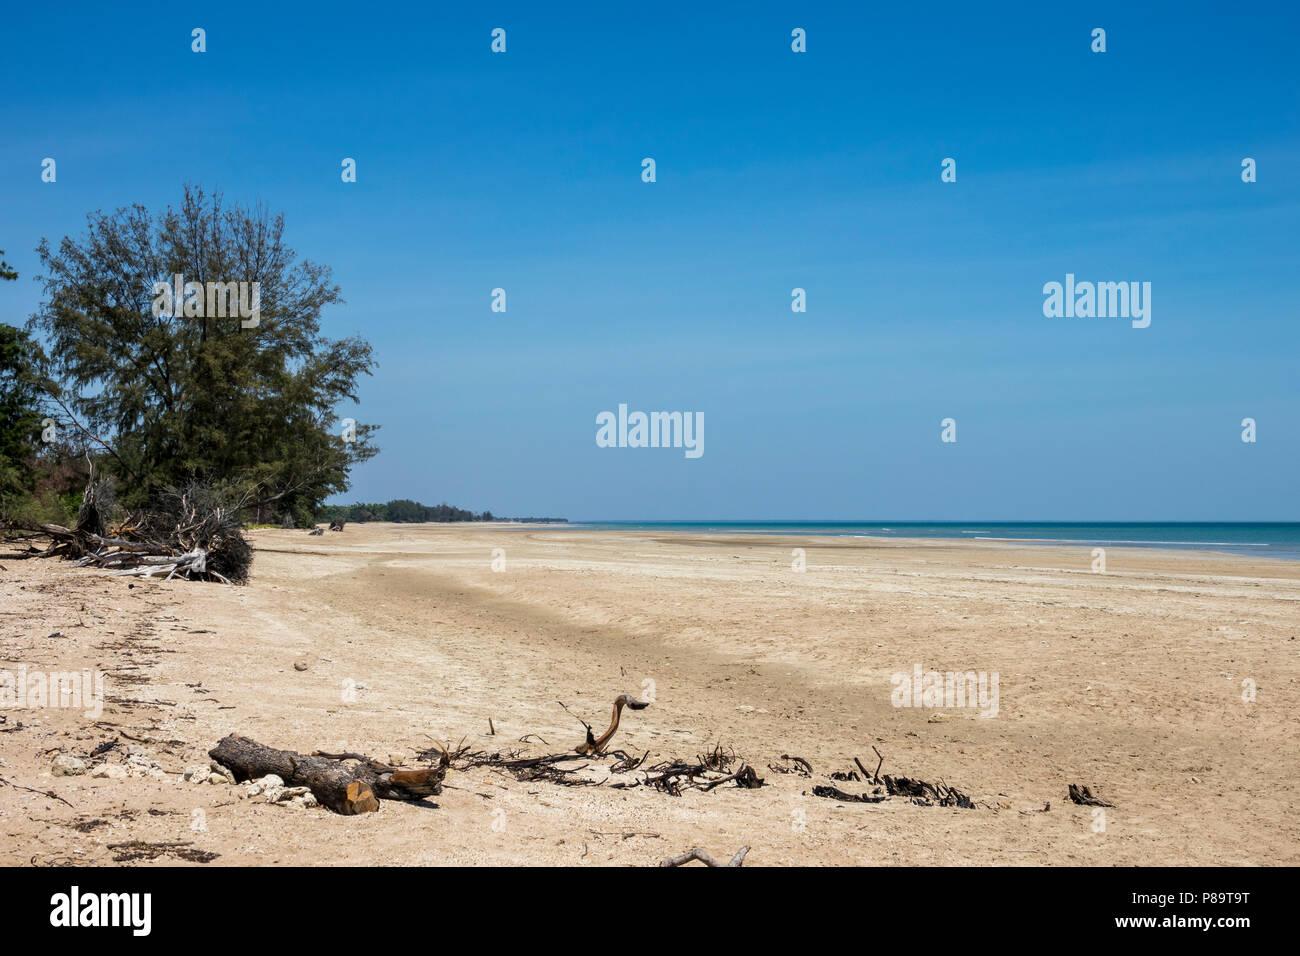 Casuarina Beach, Darwin, Northern Territory - Stock Image